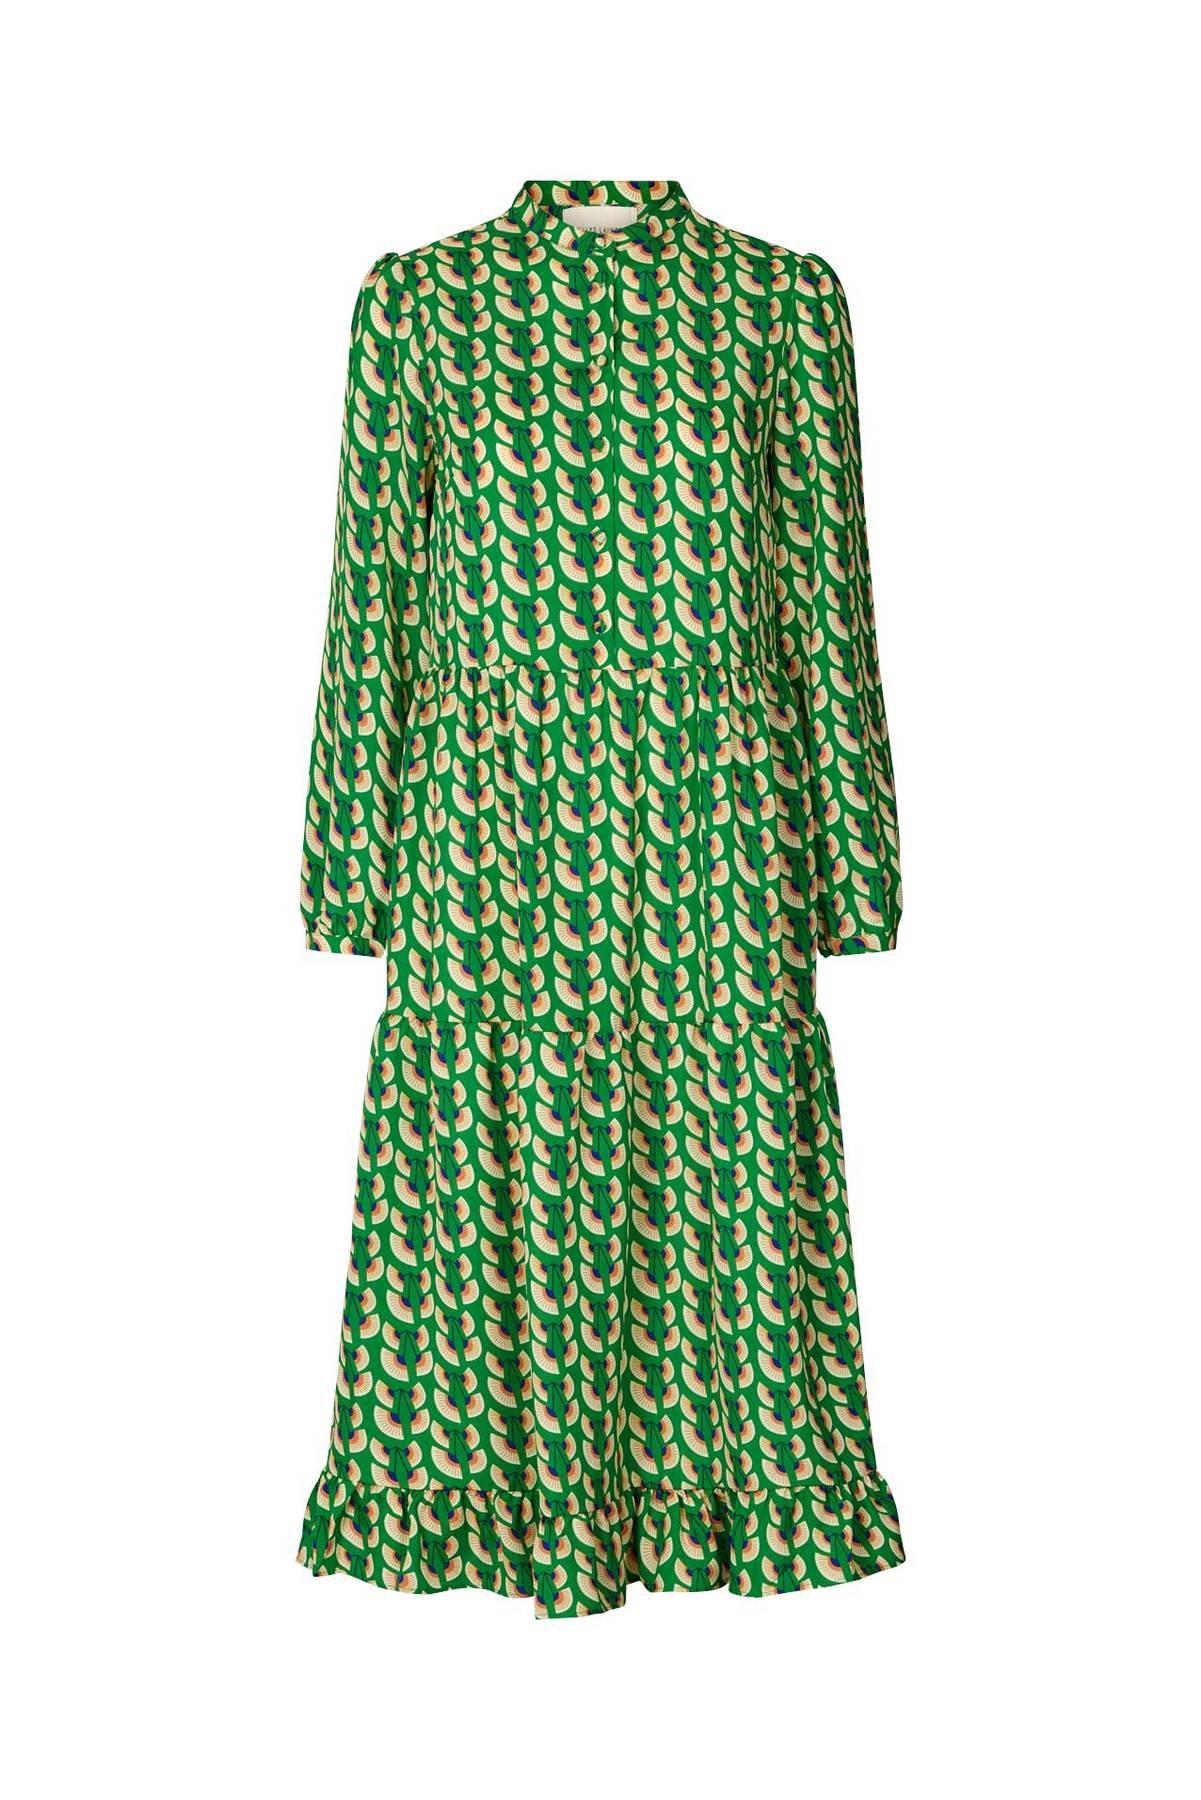 Green Anita Dress by Lollys Laundry